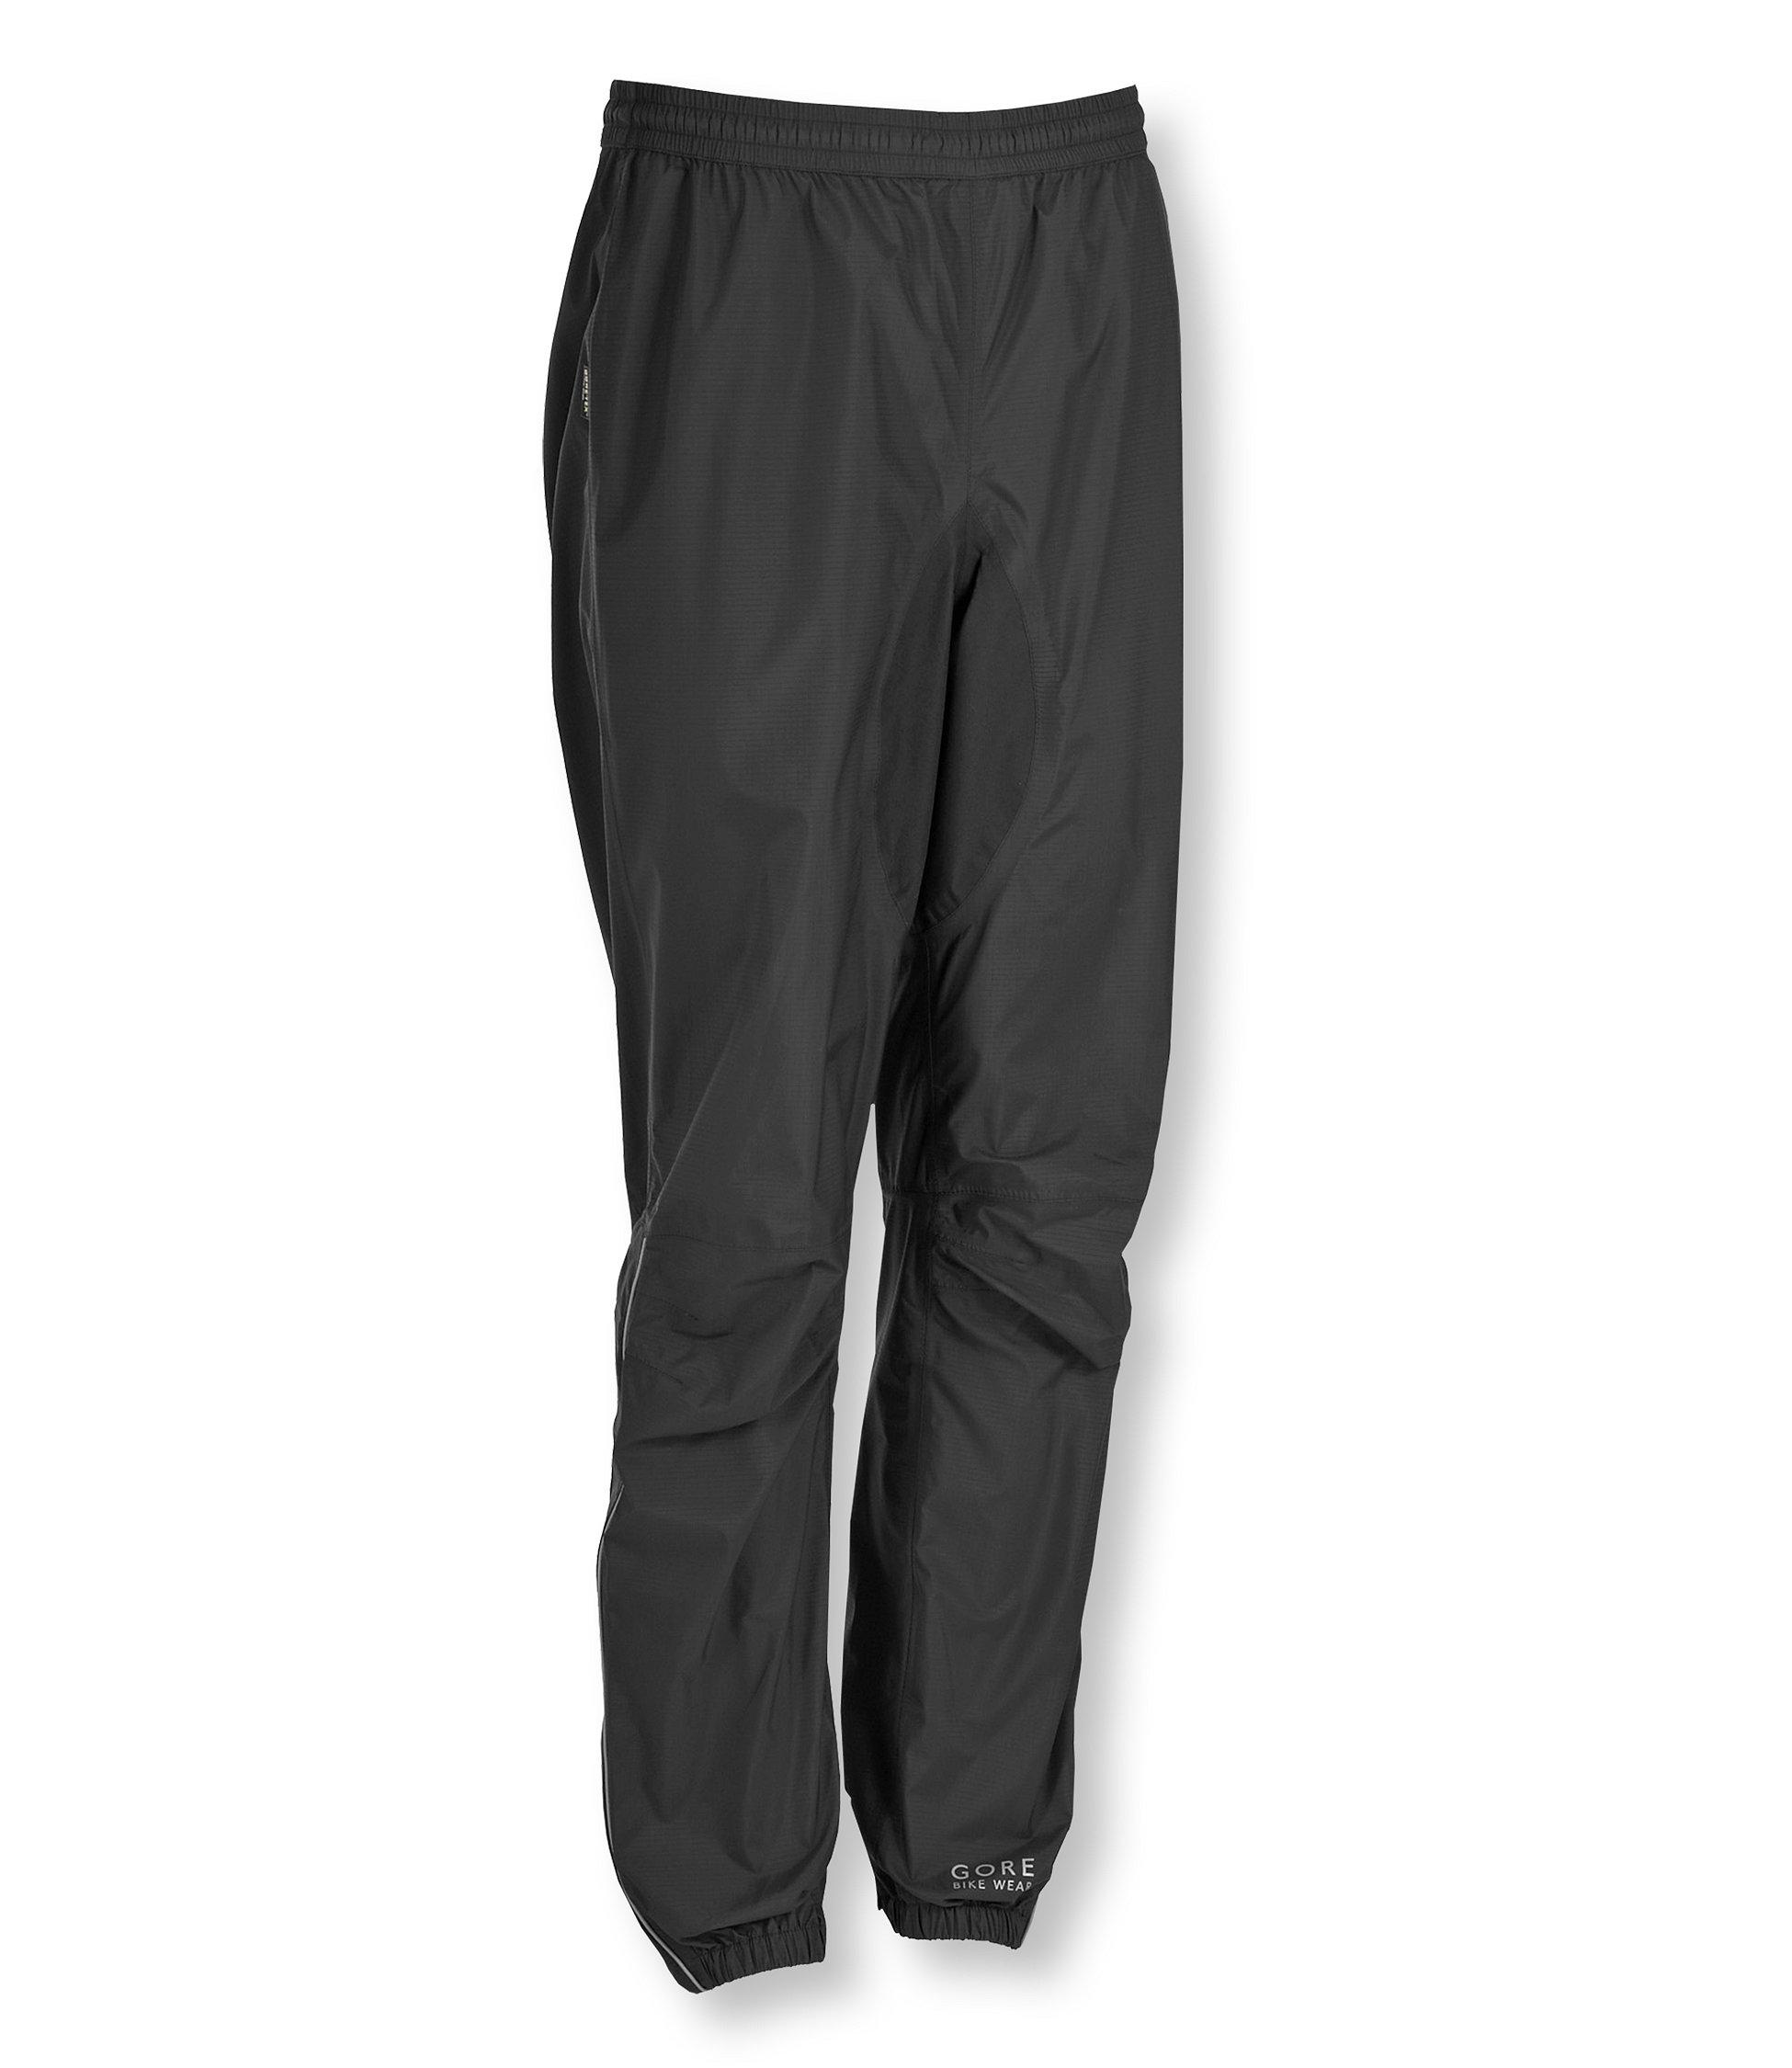 Gore Ultra II Pants